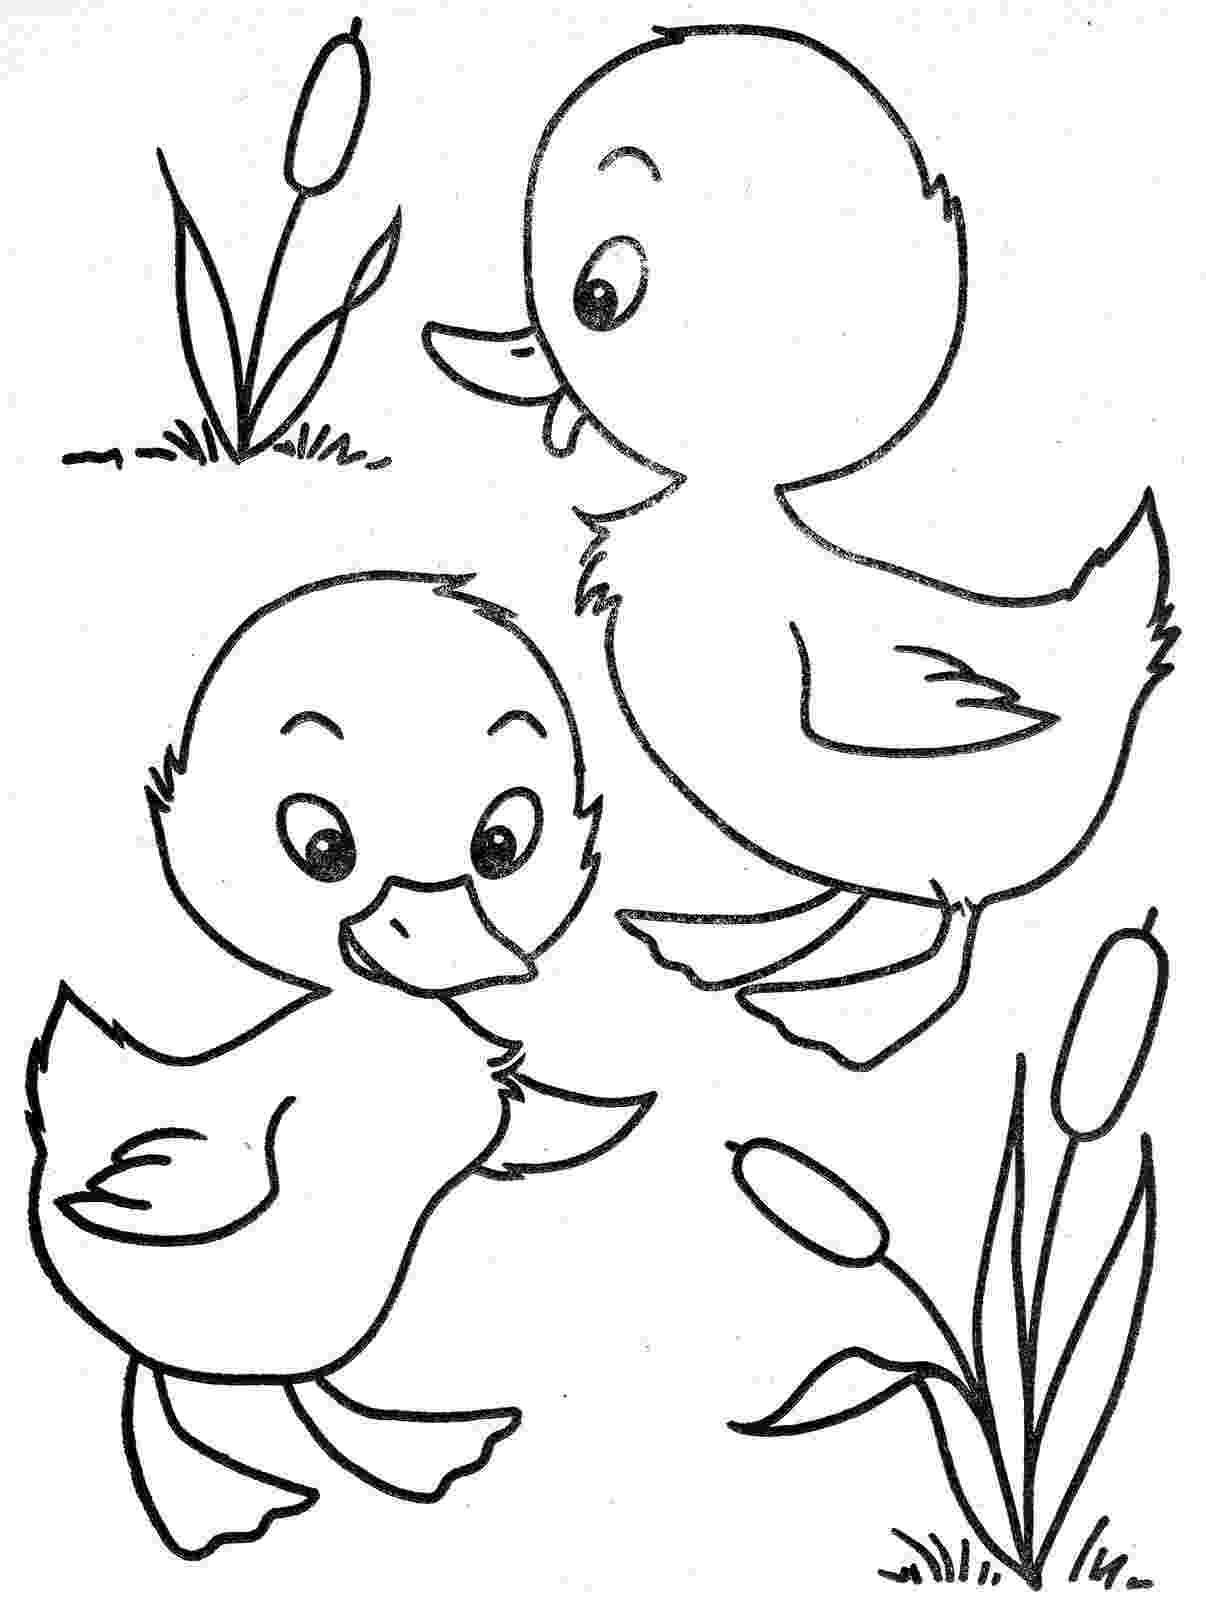 duck color sheet two little ducks embroidery patterns pinterest duck color sheet